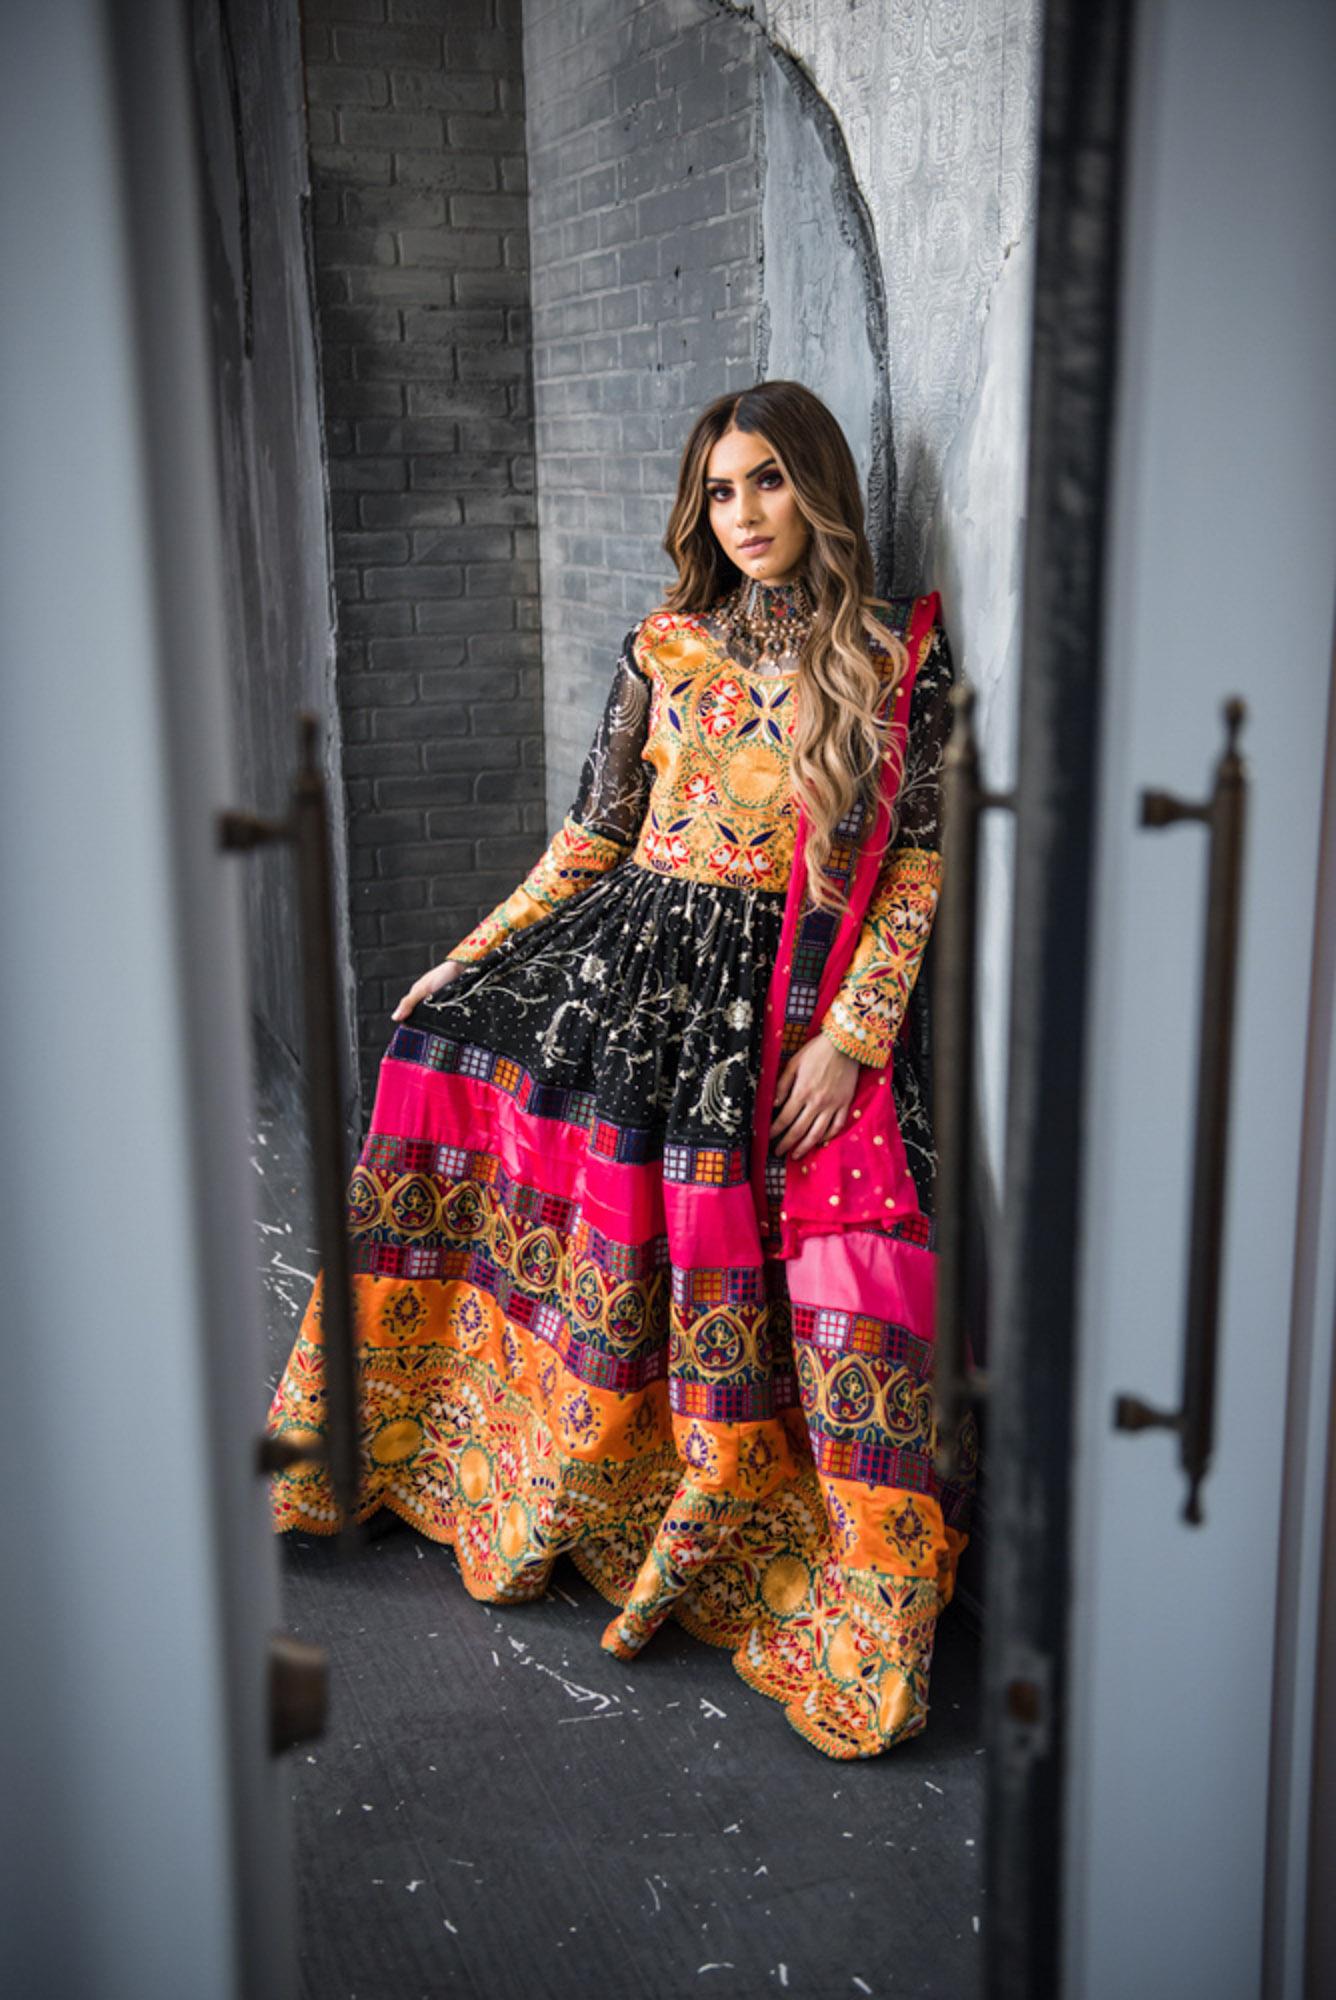 woman dress culture